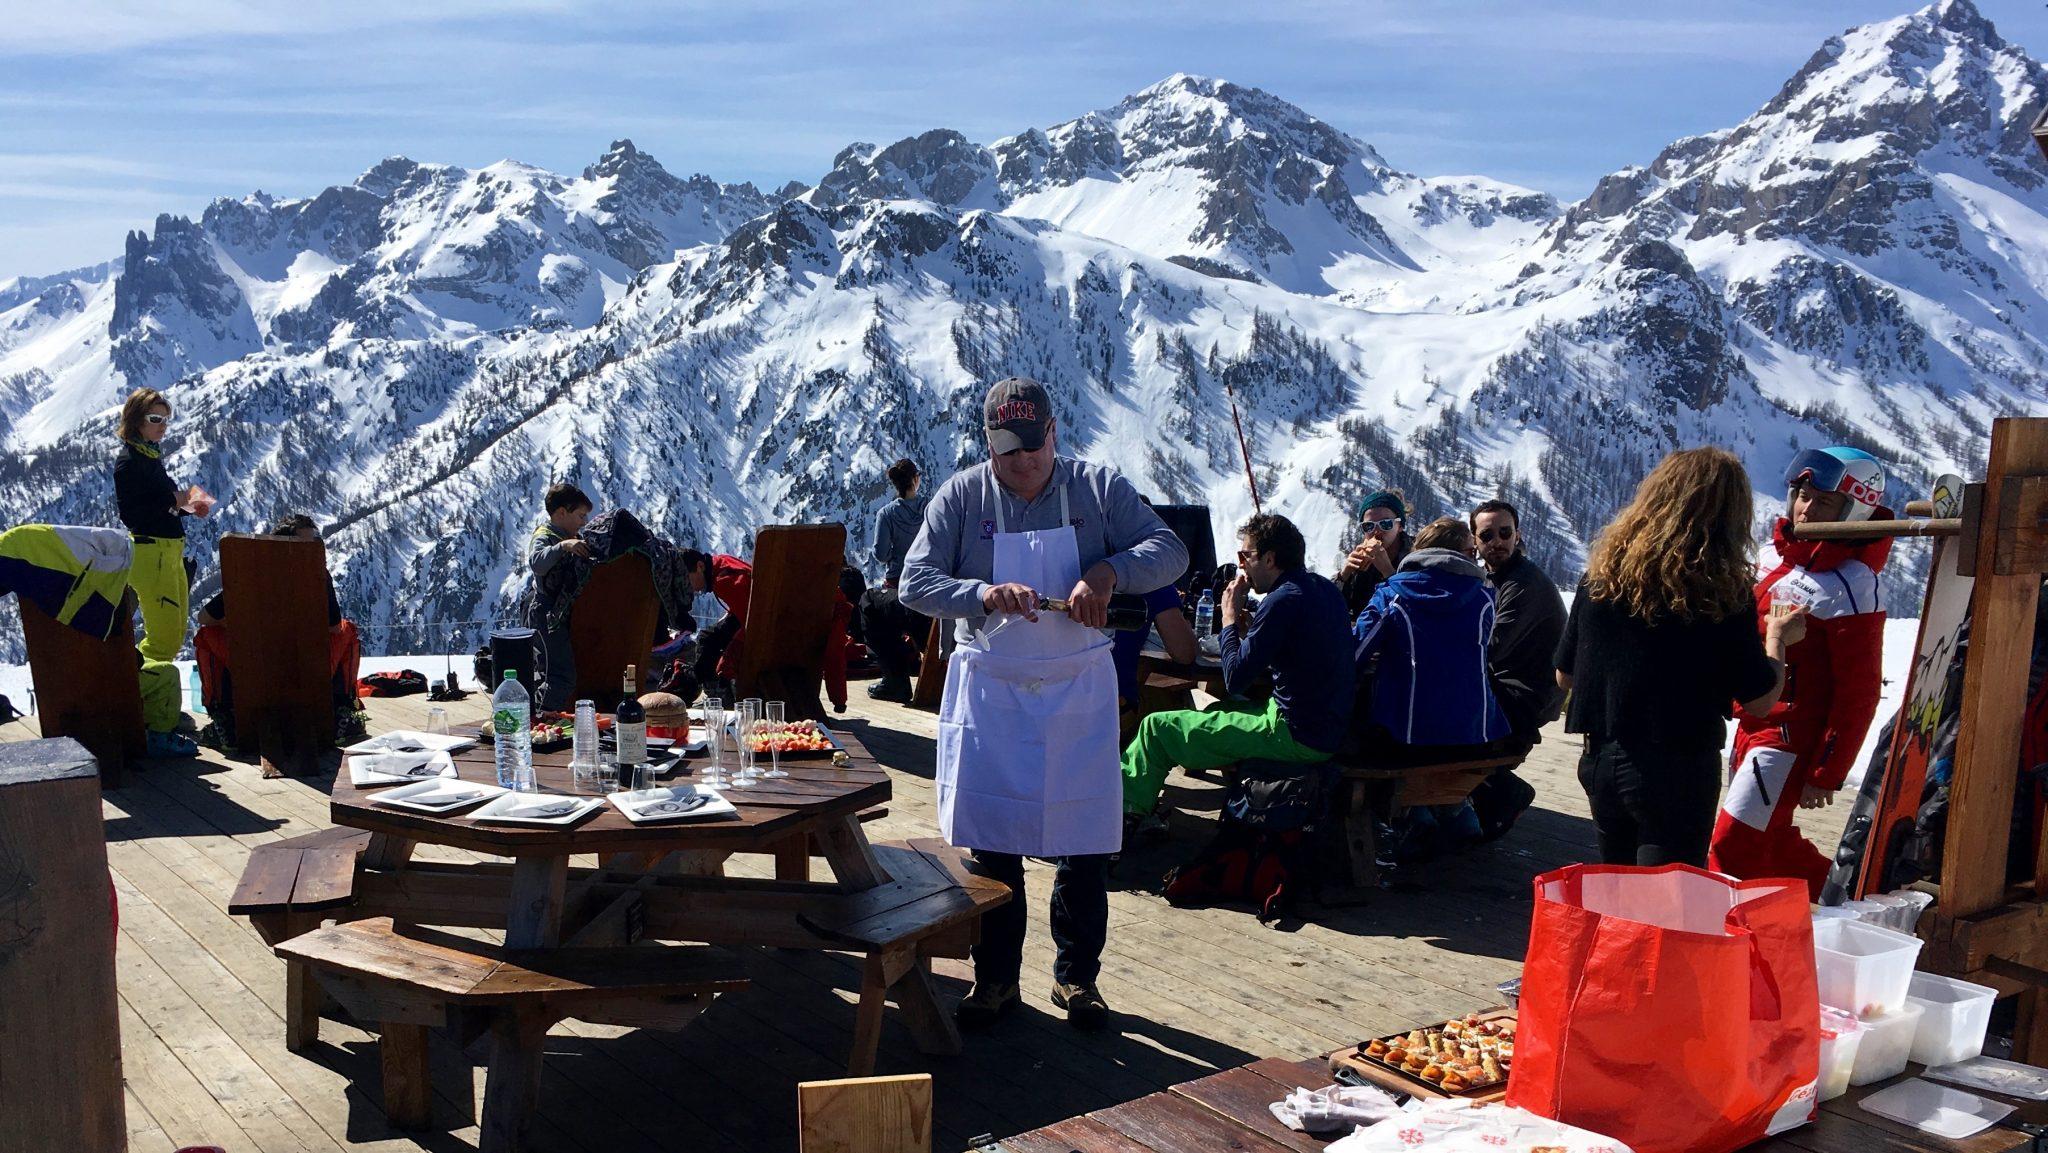 groupe-skieuses-journée-femme-kiki